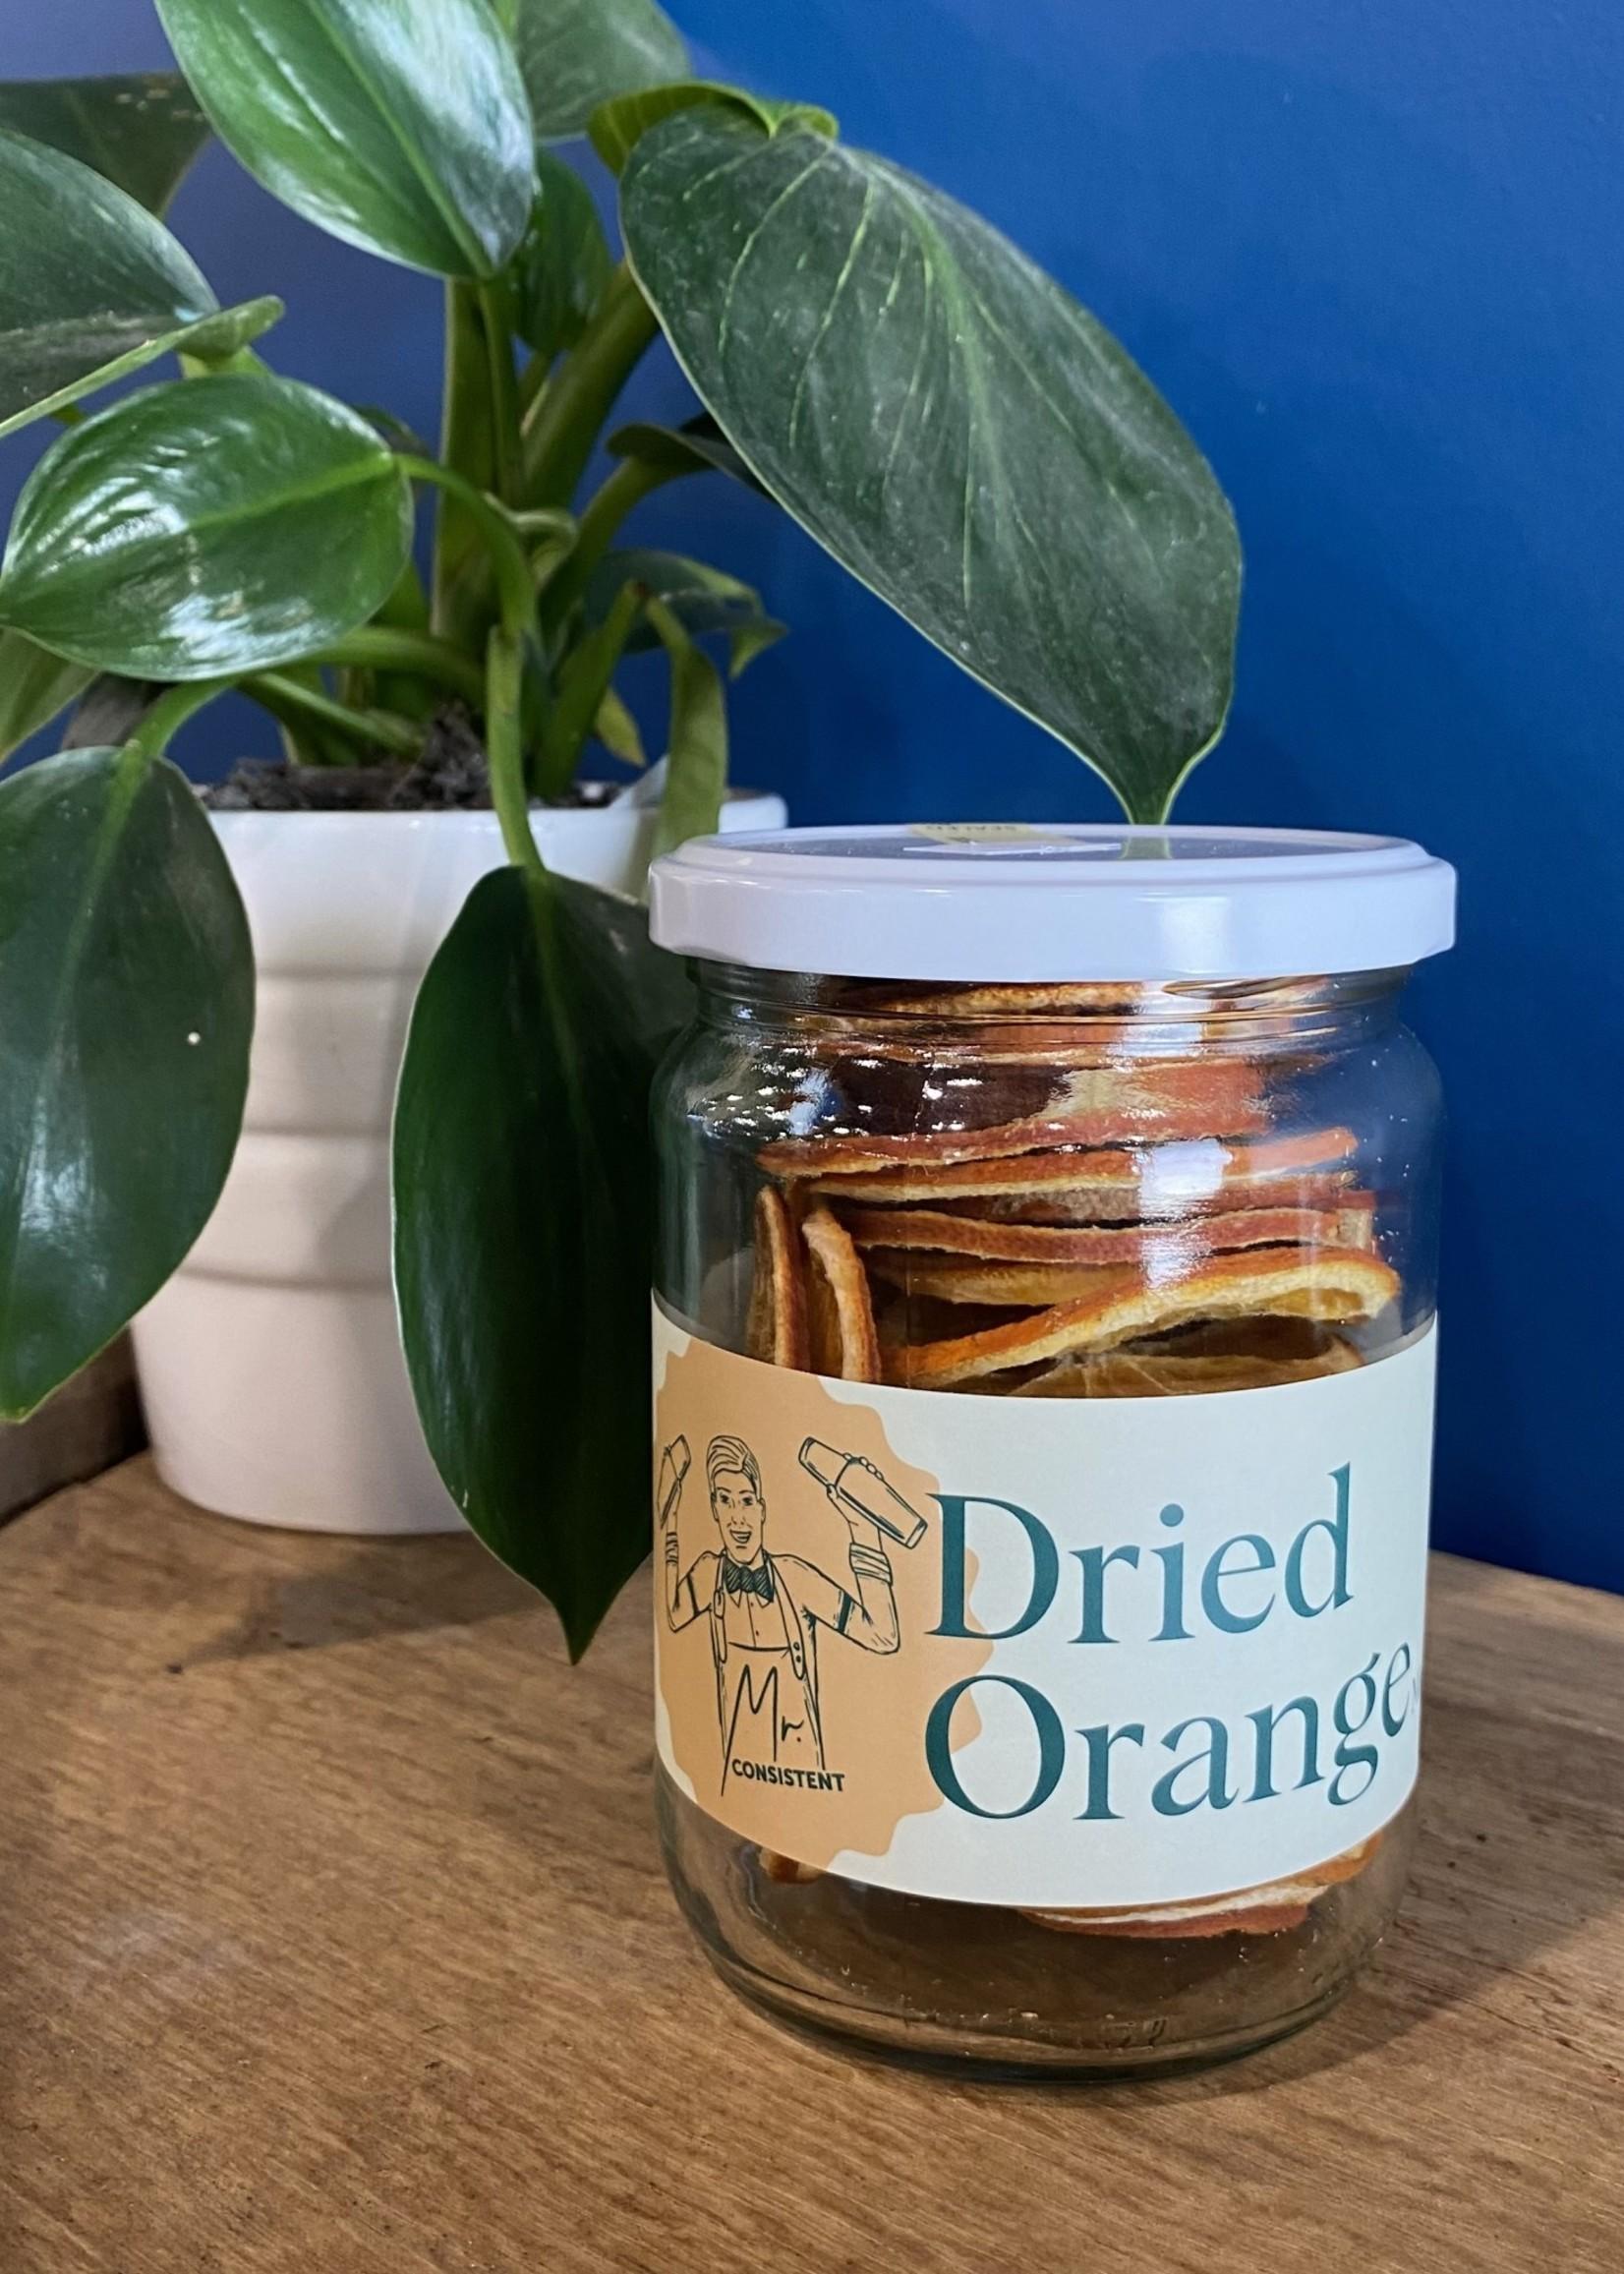 Mr Consistent Mr Consistent Dried Orange 60g